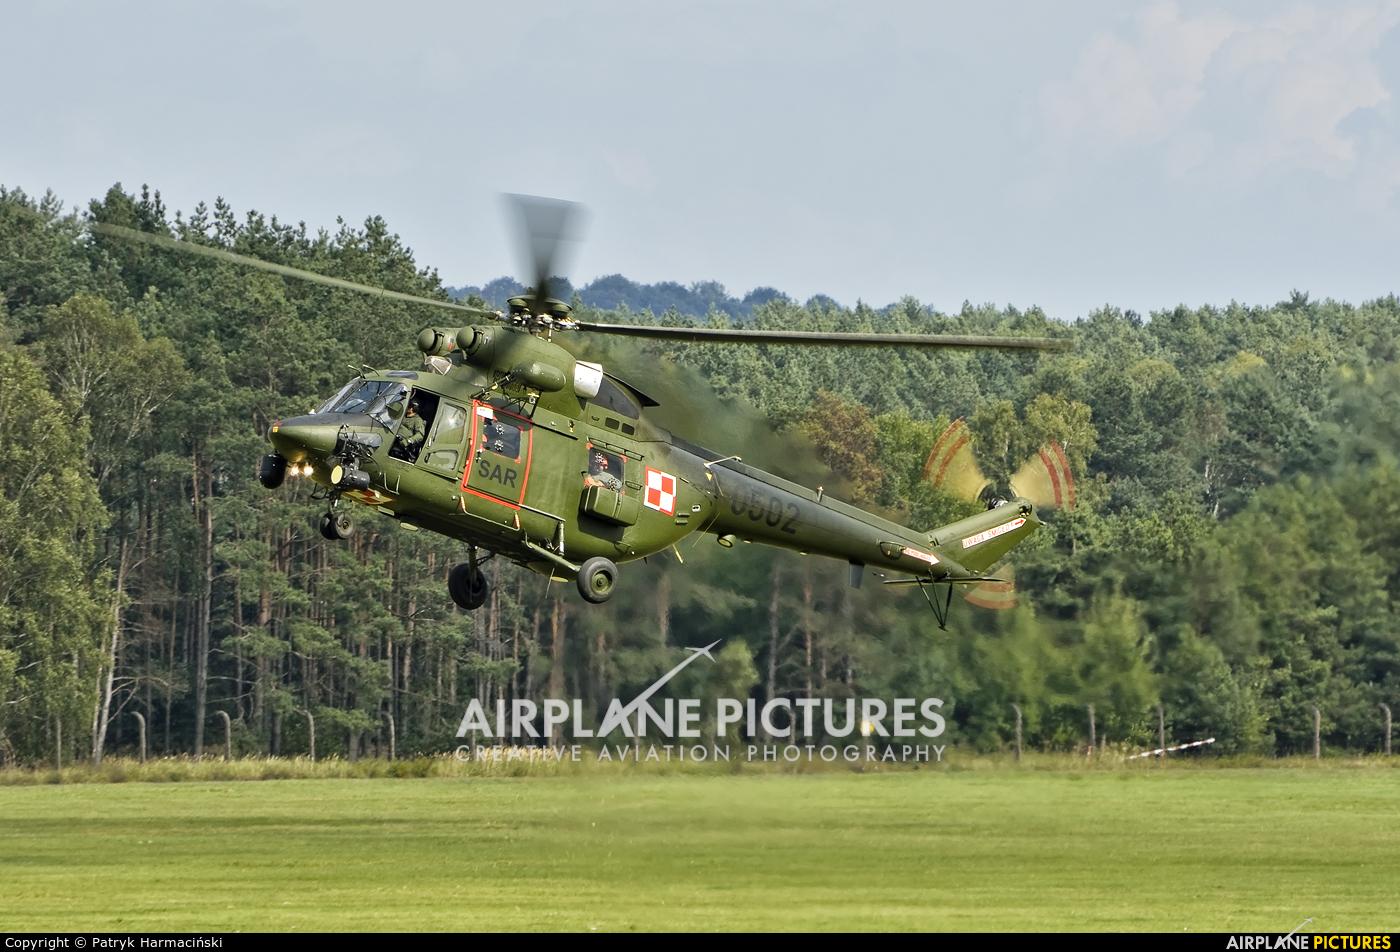 Poland - Air Force 0502 aircraft at Mirosławiec